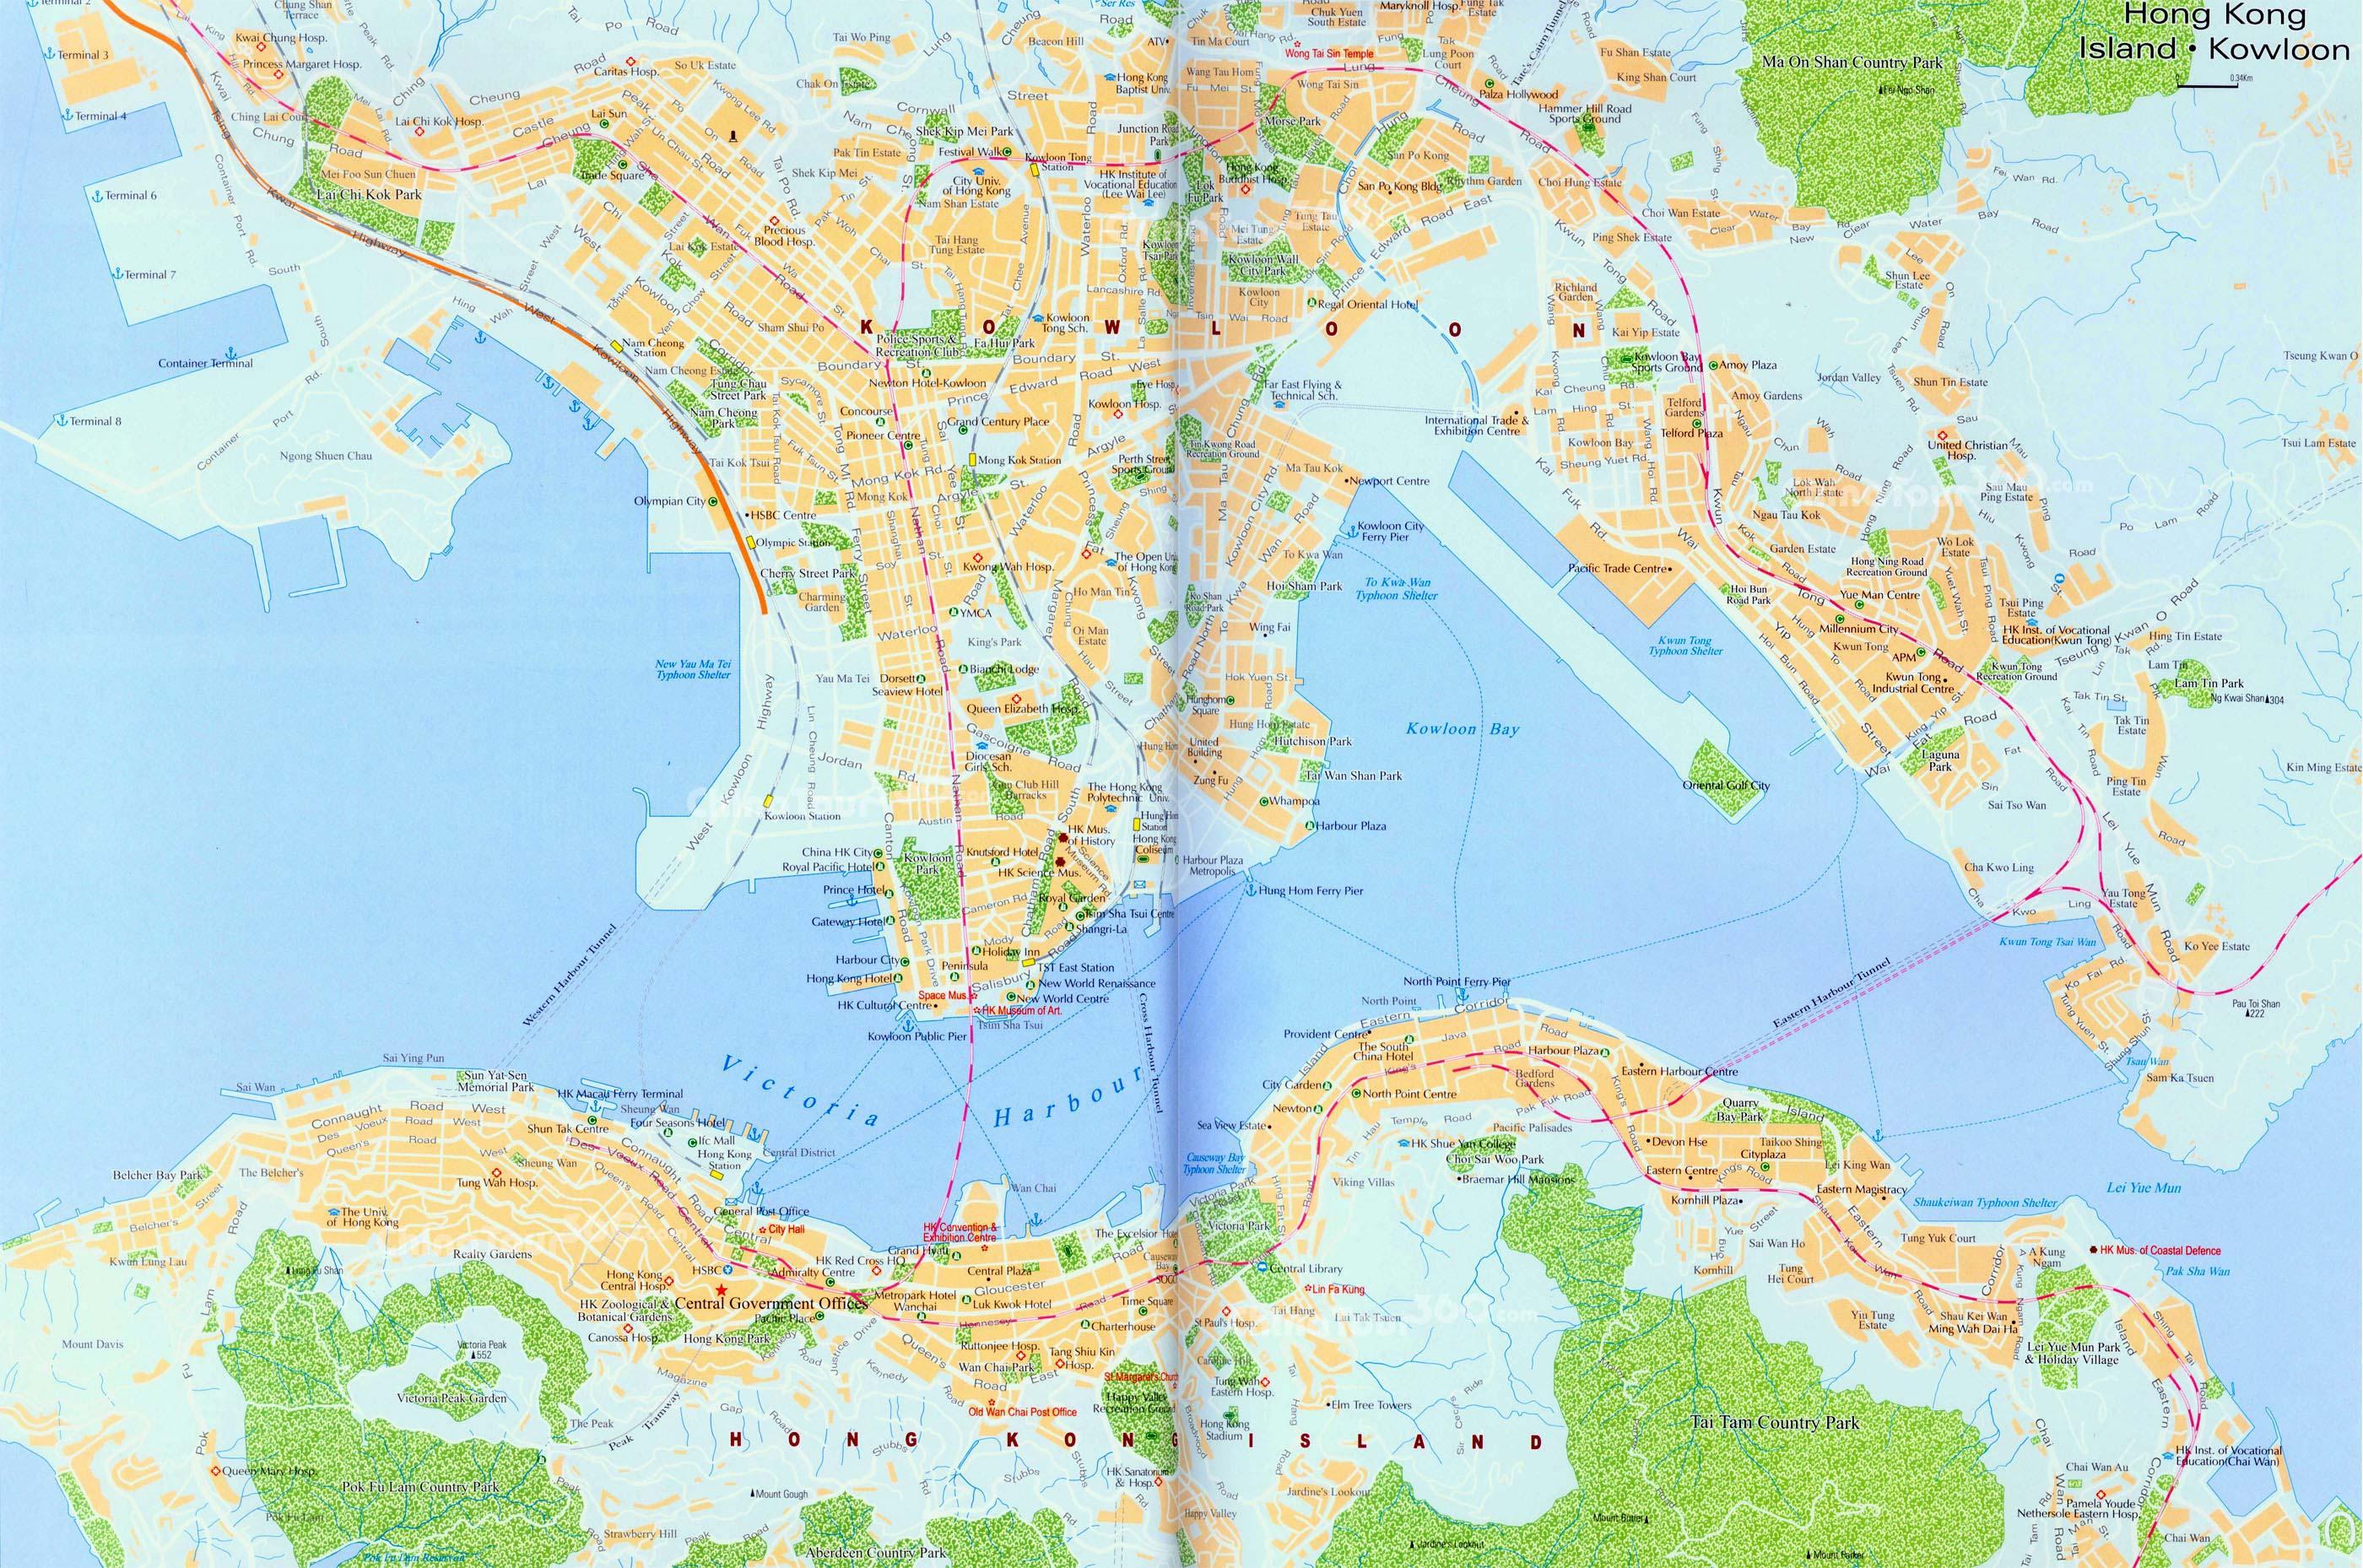 Hong Kong Island Map (Kowloon Area)